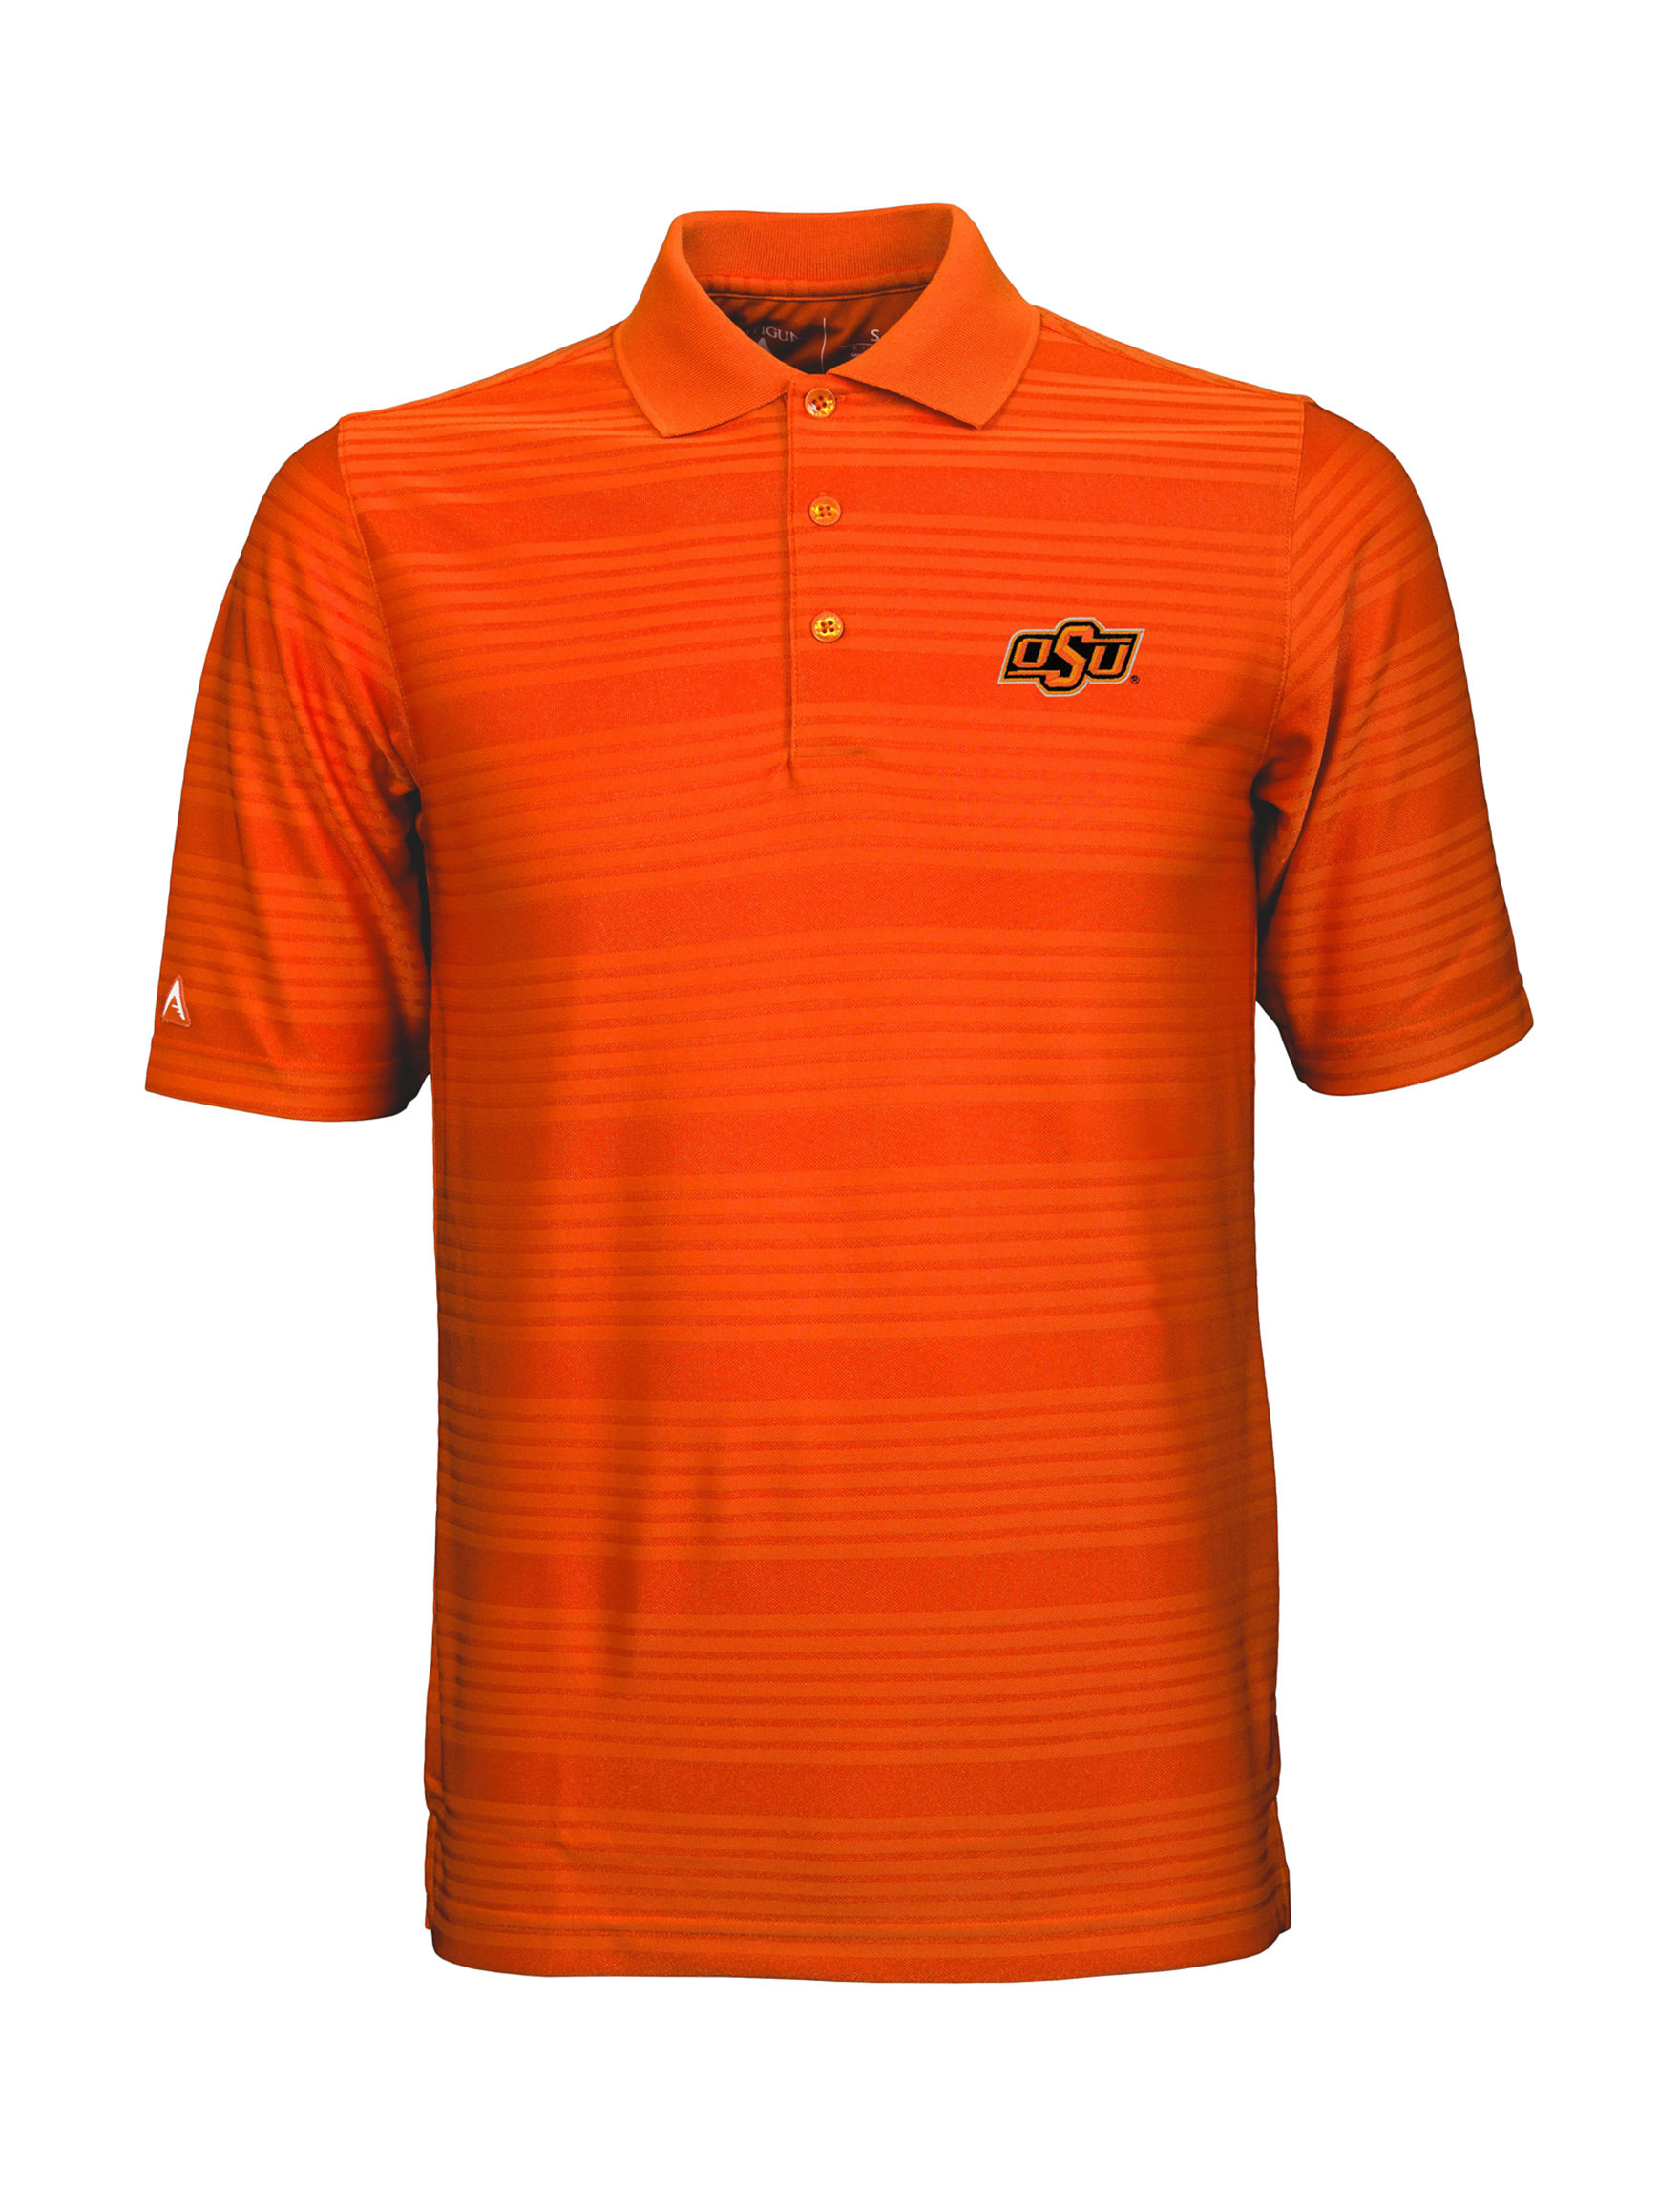 NCAA Bright Orange Polos